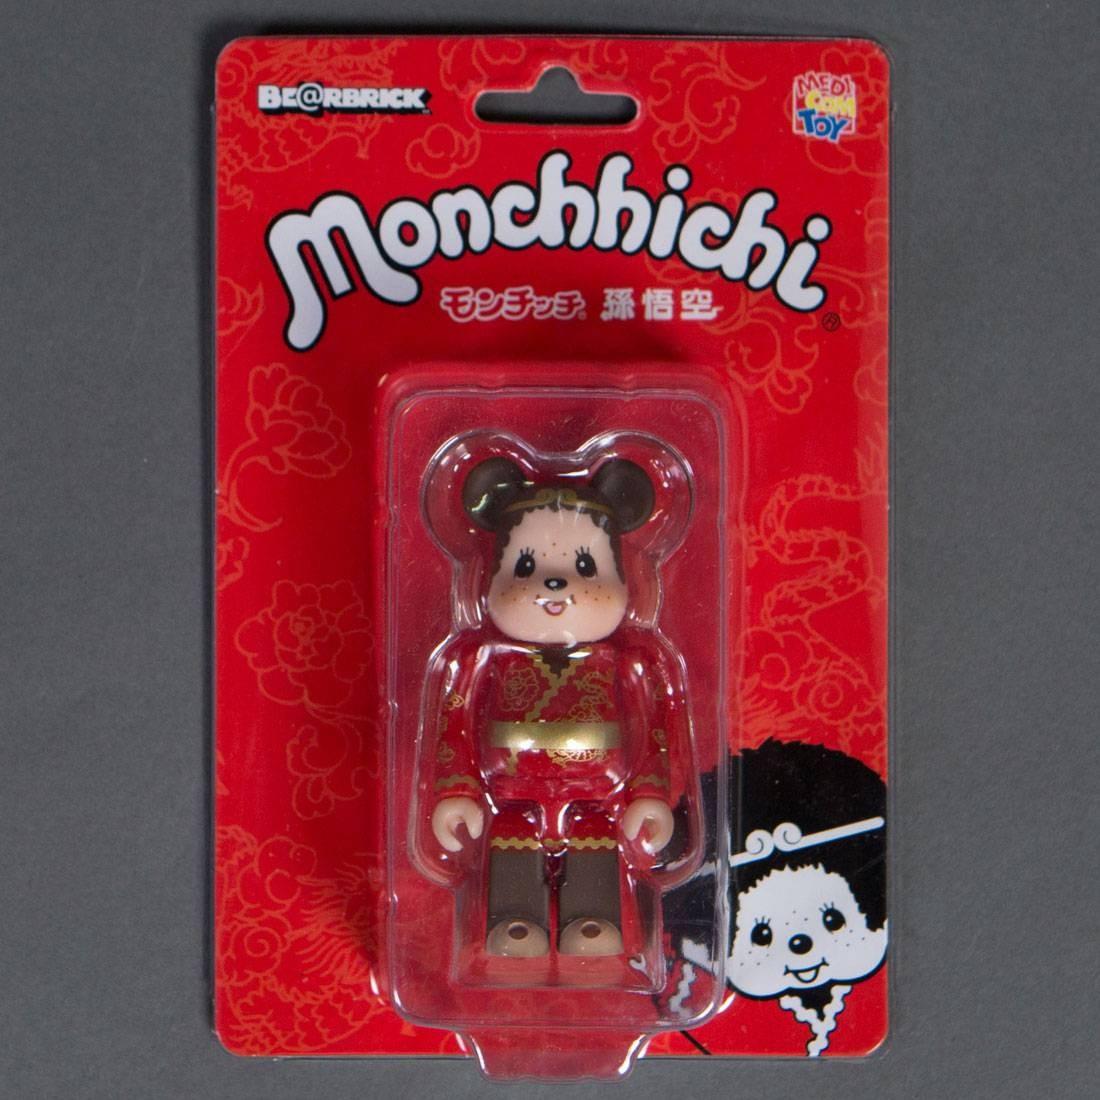 Medicom Monchhichi Songoku 100% Bearbrick Figure (red / brown)